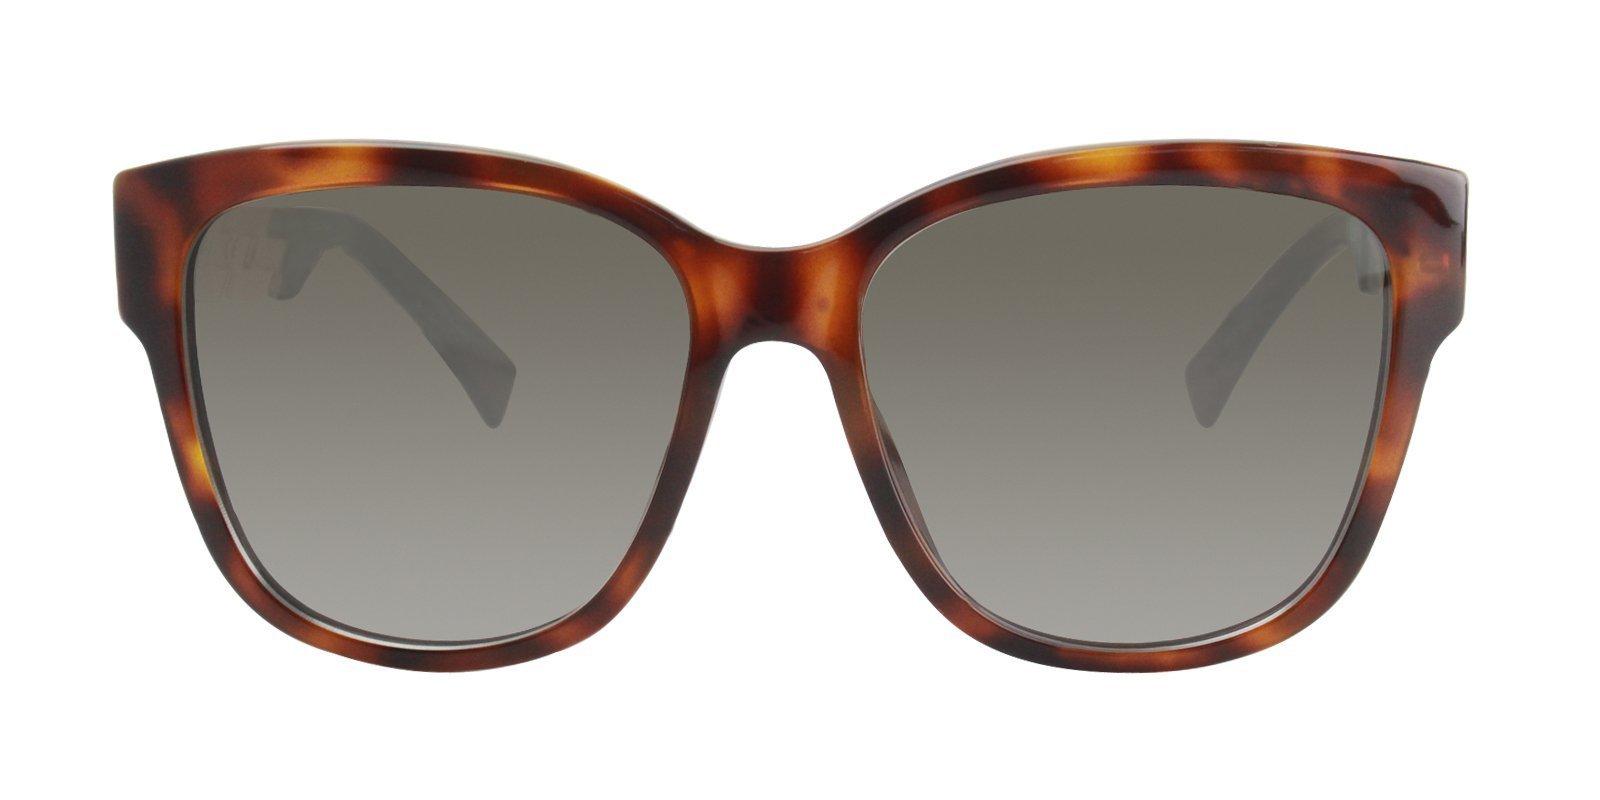 9d9e29e07cdb5 Dior - Ribbon1N Tortoise - Gray sunglasses in 2018